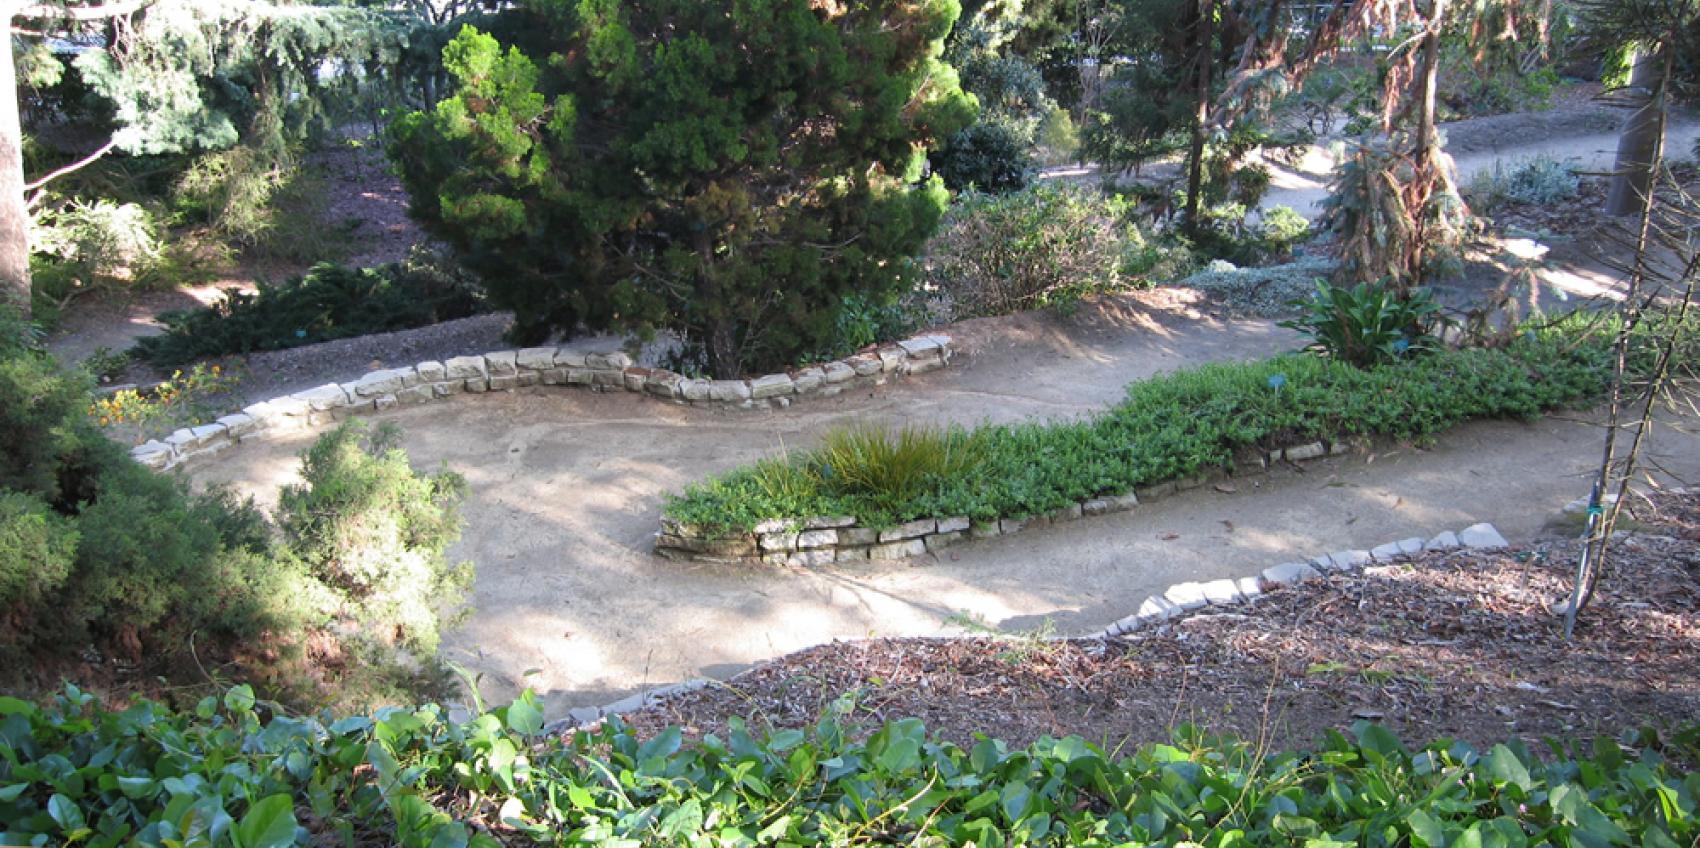 Superieur Mildred E Mathias Botanical Gardens   American Public Gardens Association